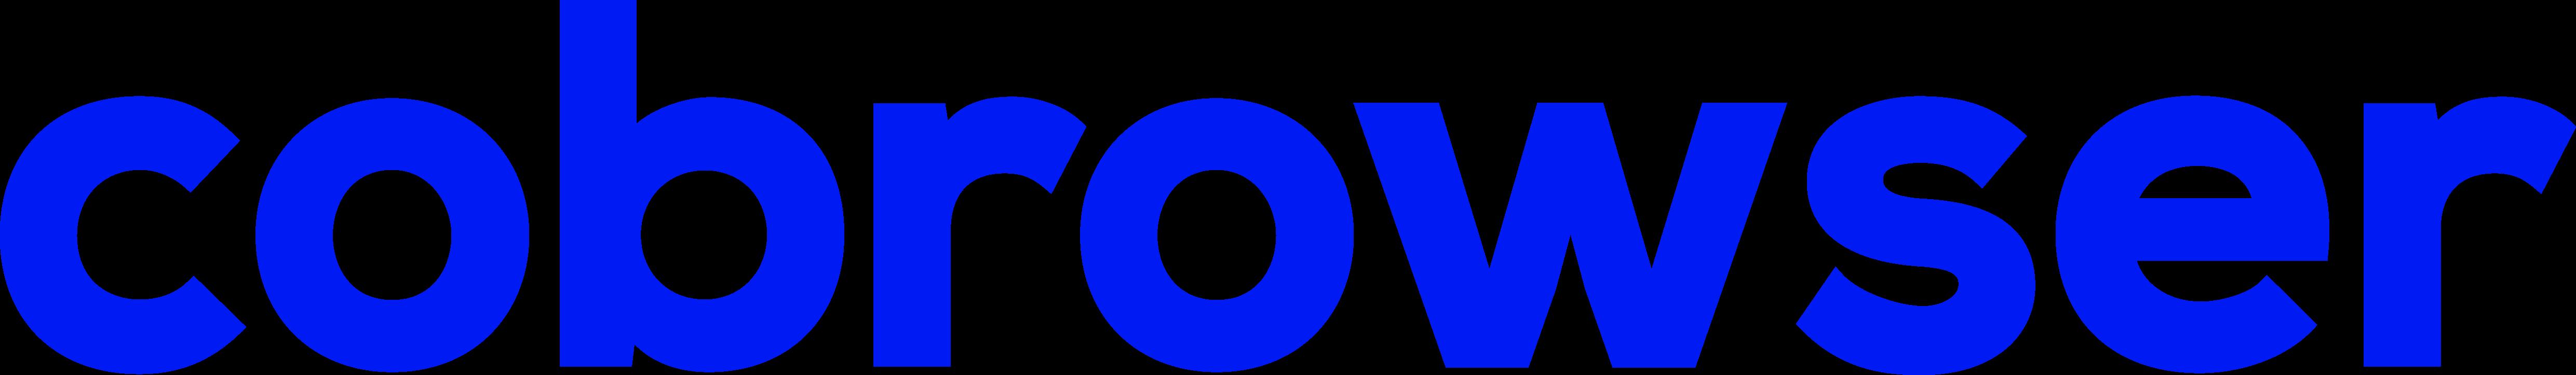 Cob logo blauw v10 j